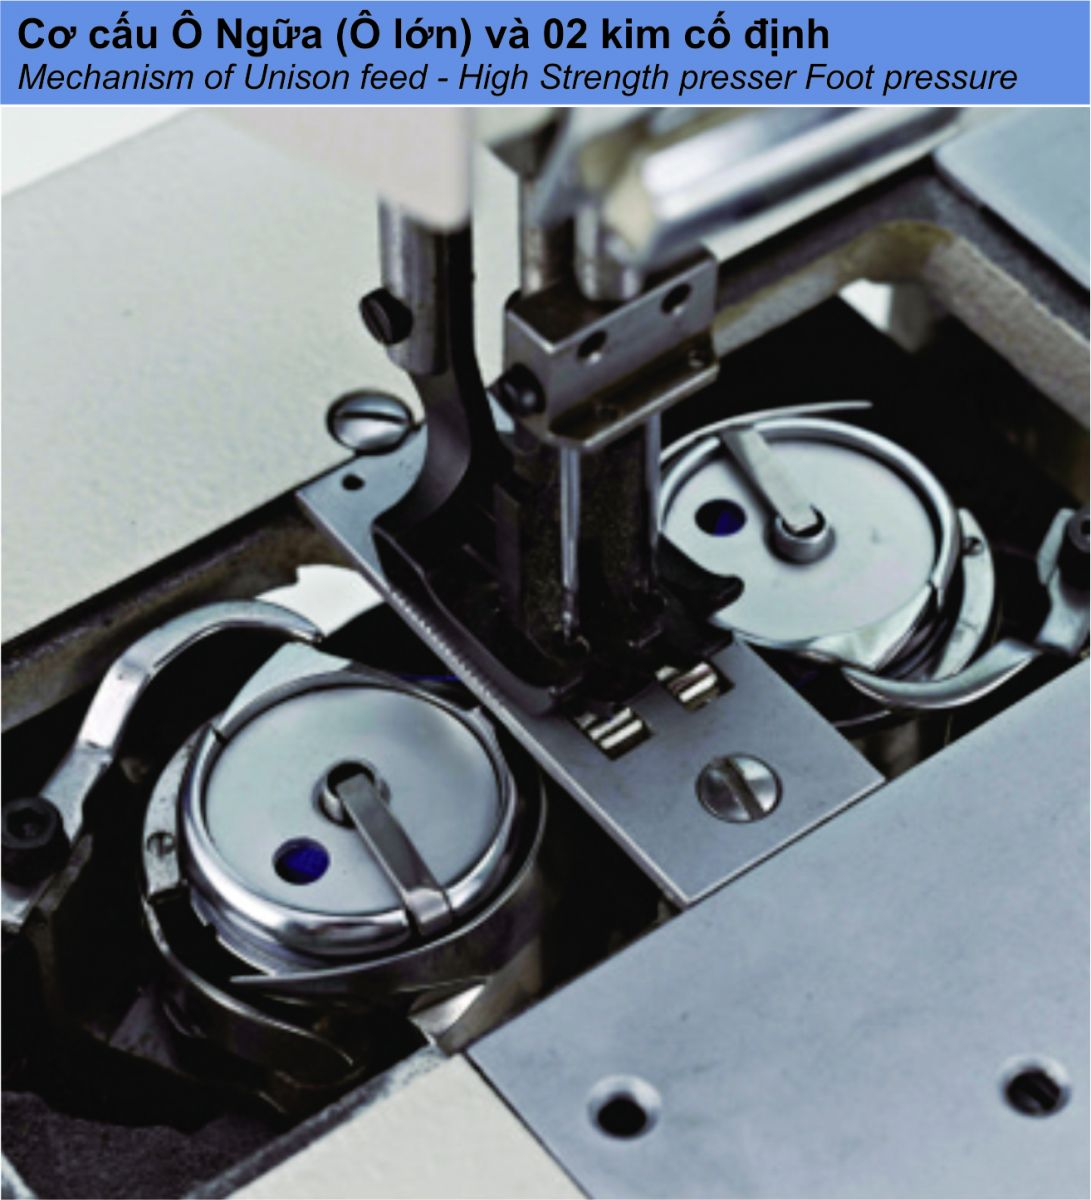 Electronic sewing machine Britex Needle Lockstitch Heavy - 20618